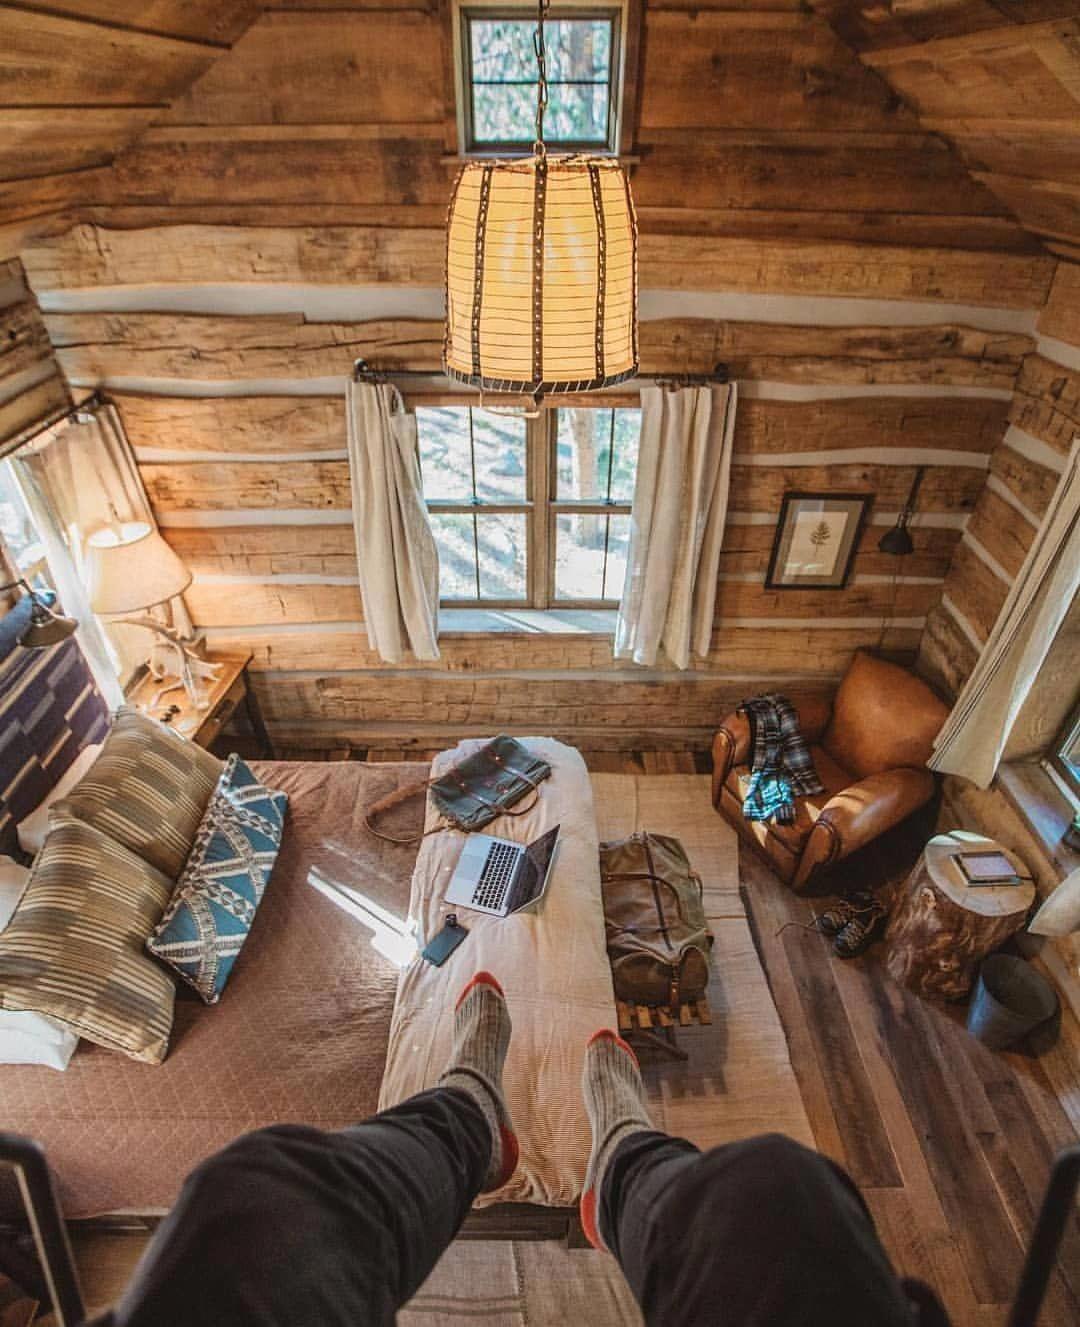 Pin by Karmen Klug on cabin Cozy cabin bedrooms, Cozy